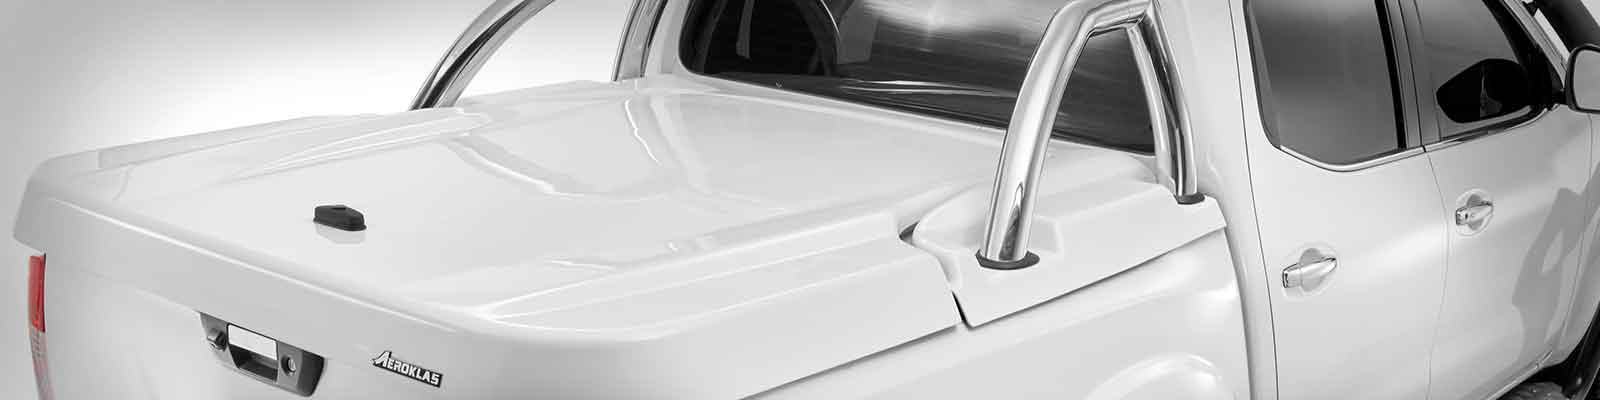 Aeroklas ABS Plastic Hard Load Bed Covers